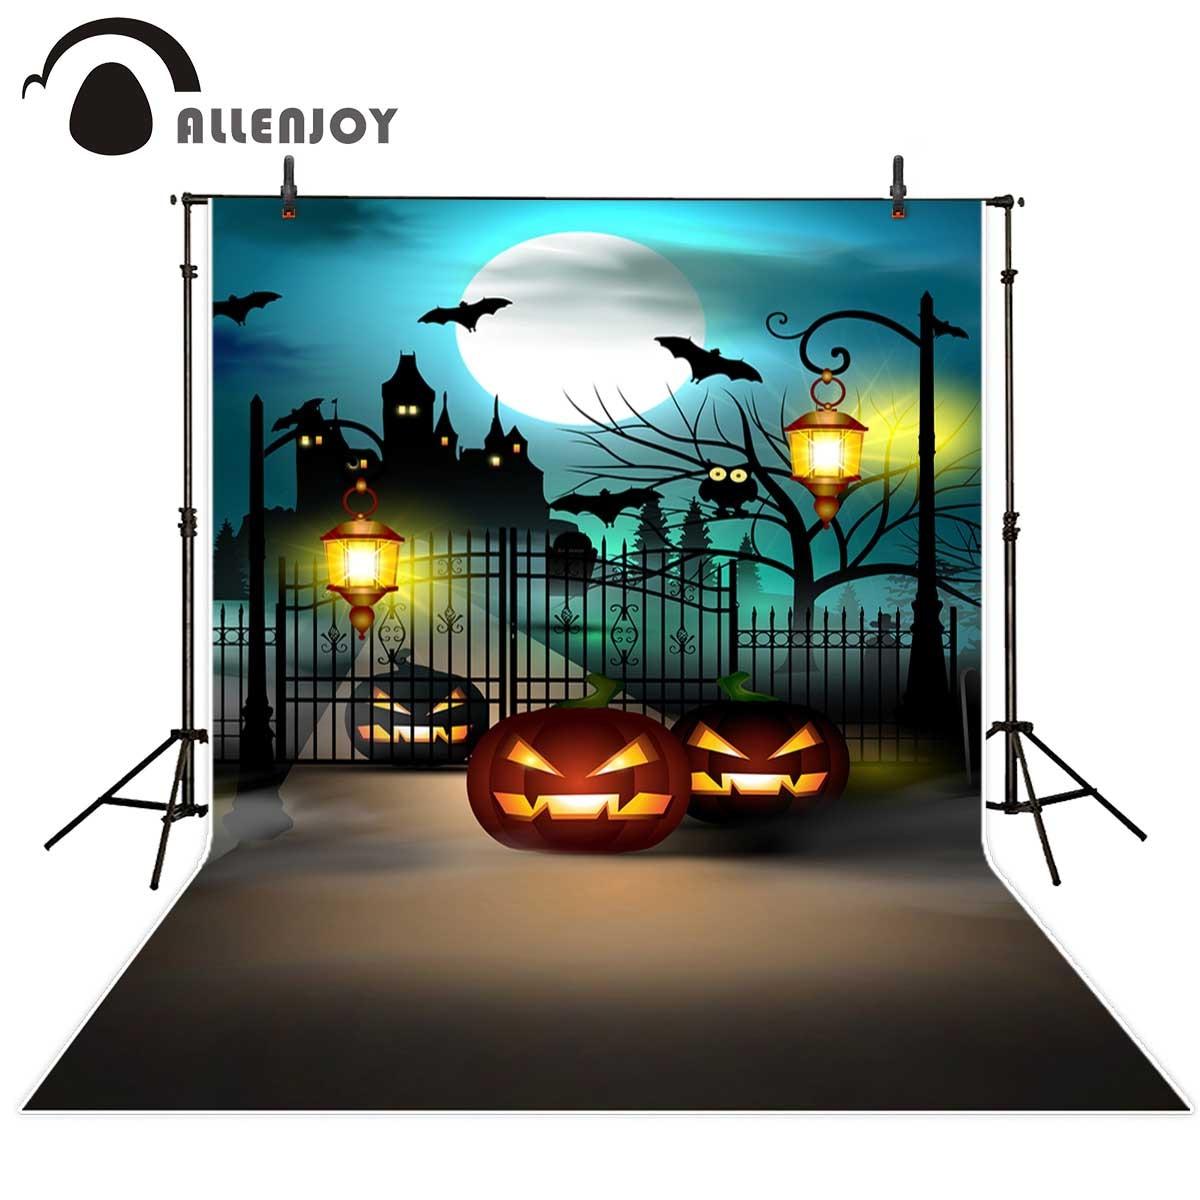 Allenjoy photography backdrop Moon Castle Horse Light Fence Door Pumpkin Head professional festival backdrop photographic